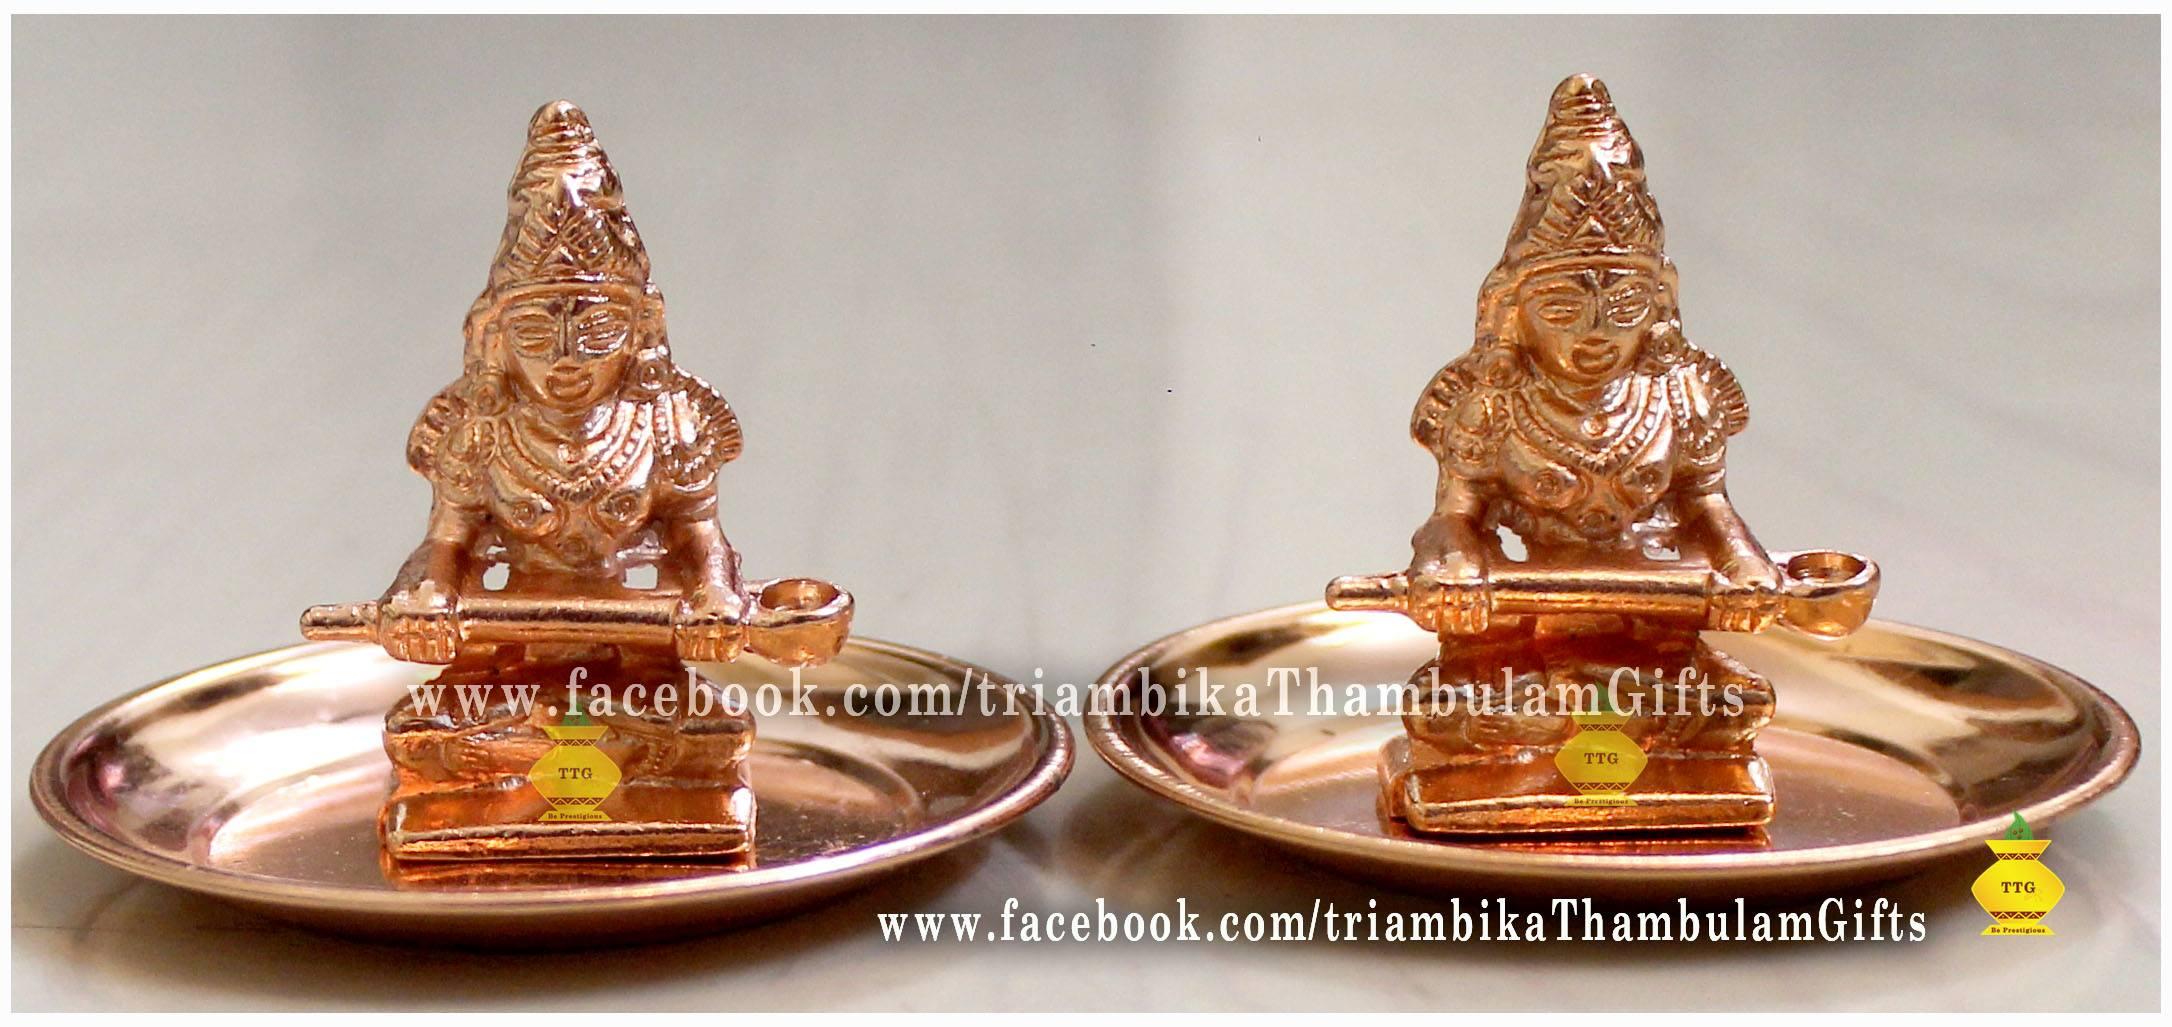 Wedding Return Gift Shops In Chennai: Return Gifts Shop In Chennai